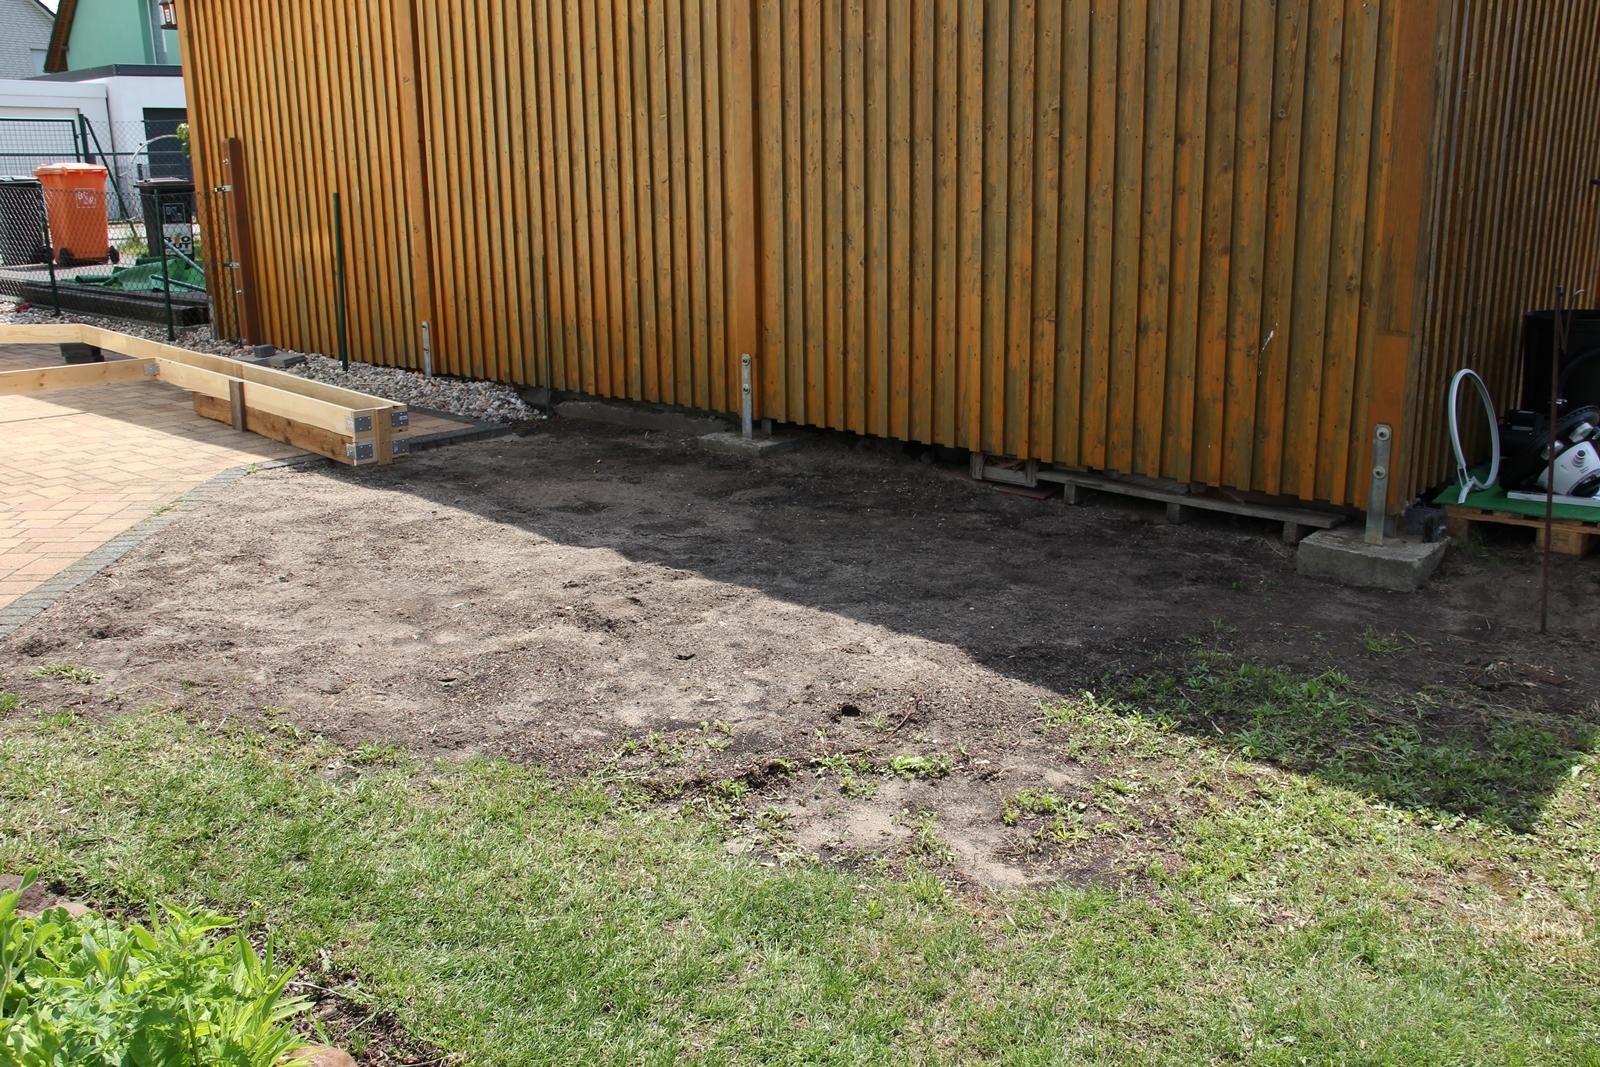 dmmung aus polen awesome betongarage aus polen with. Black Bedroom Furniture Sets. Home Design Ideas